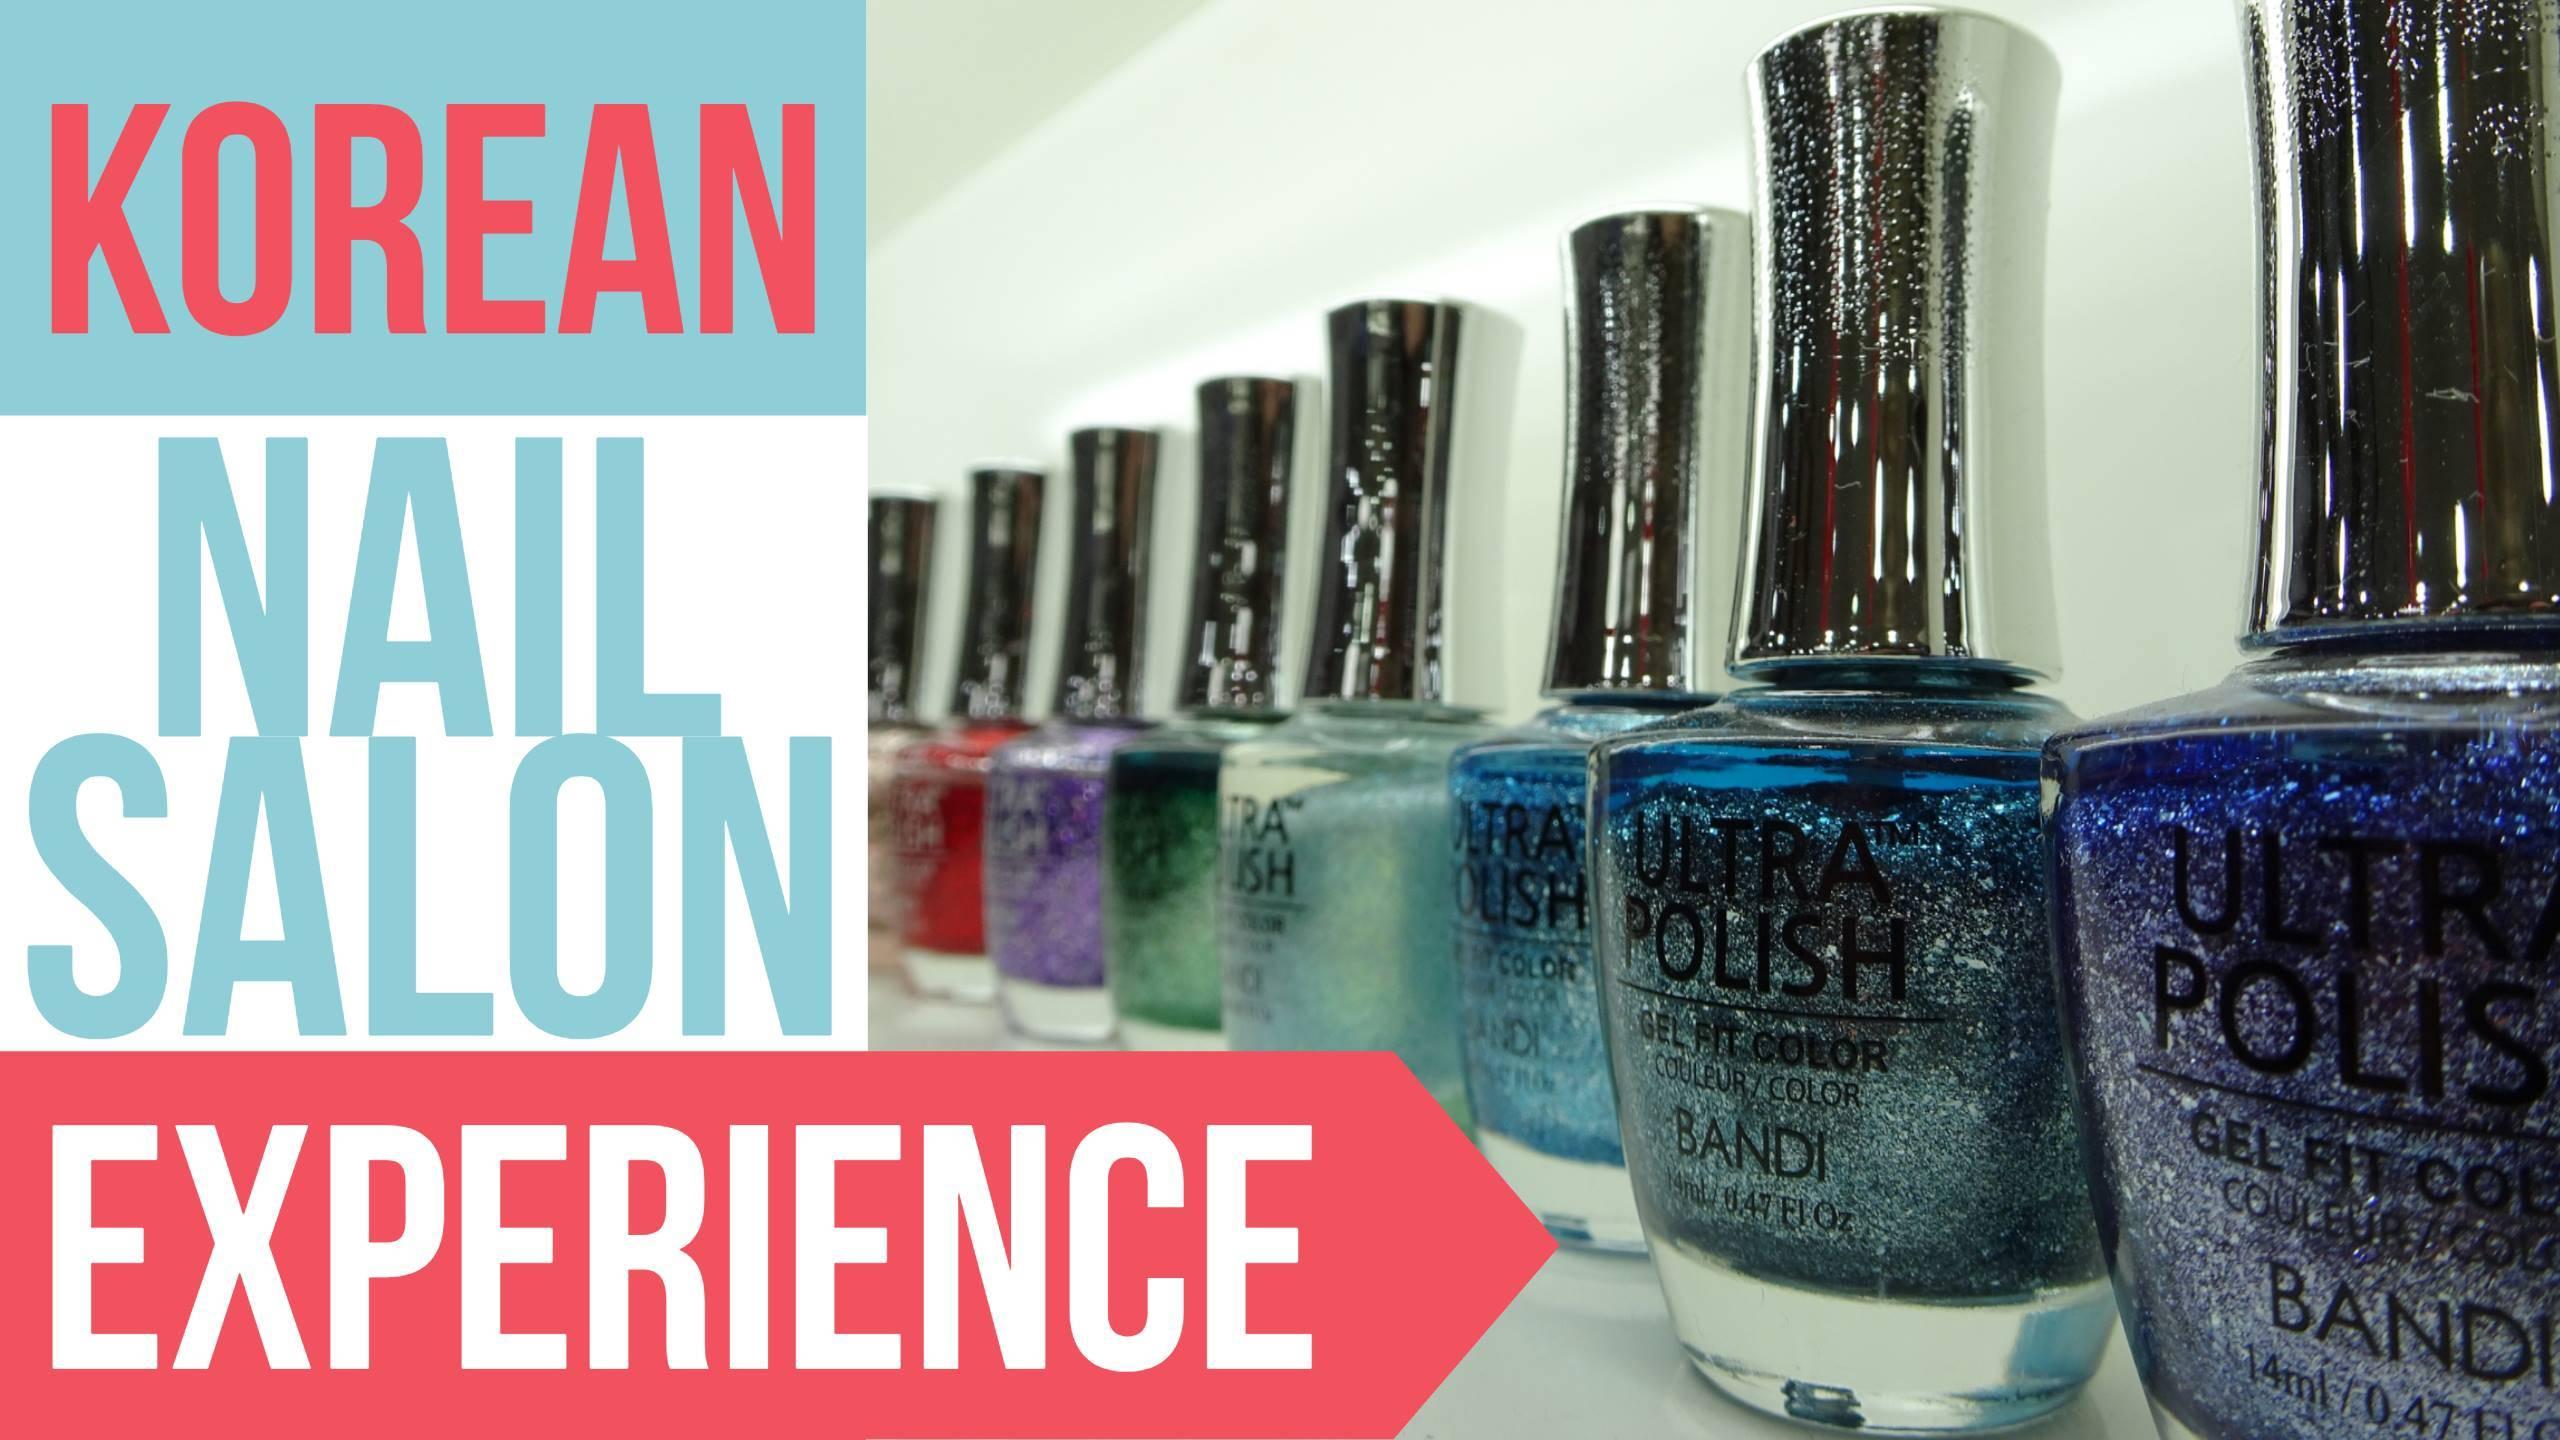 ottoKWORLD Presents] Korean Nail Salon + Nail Art Experience